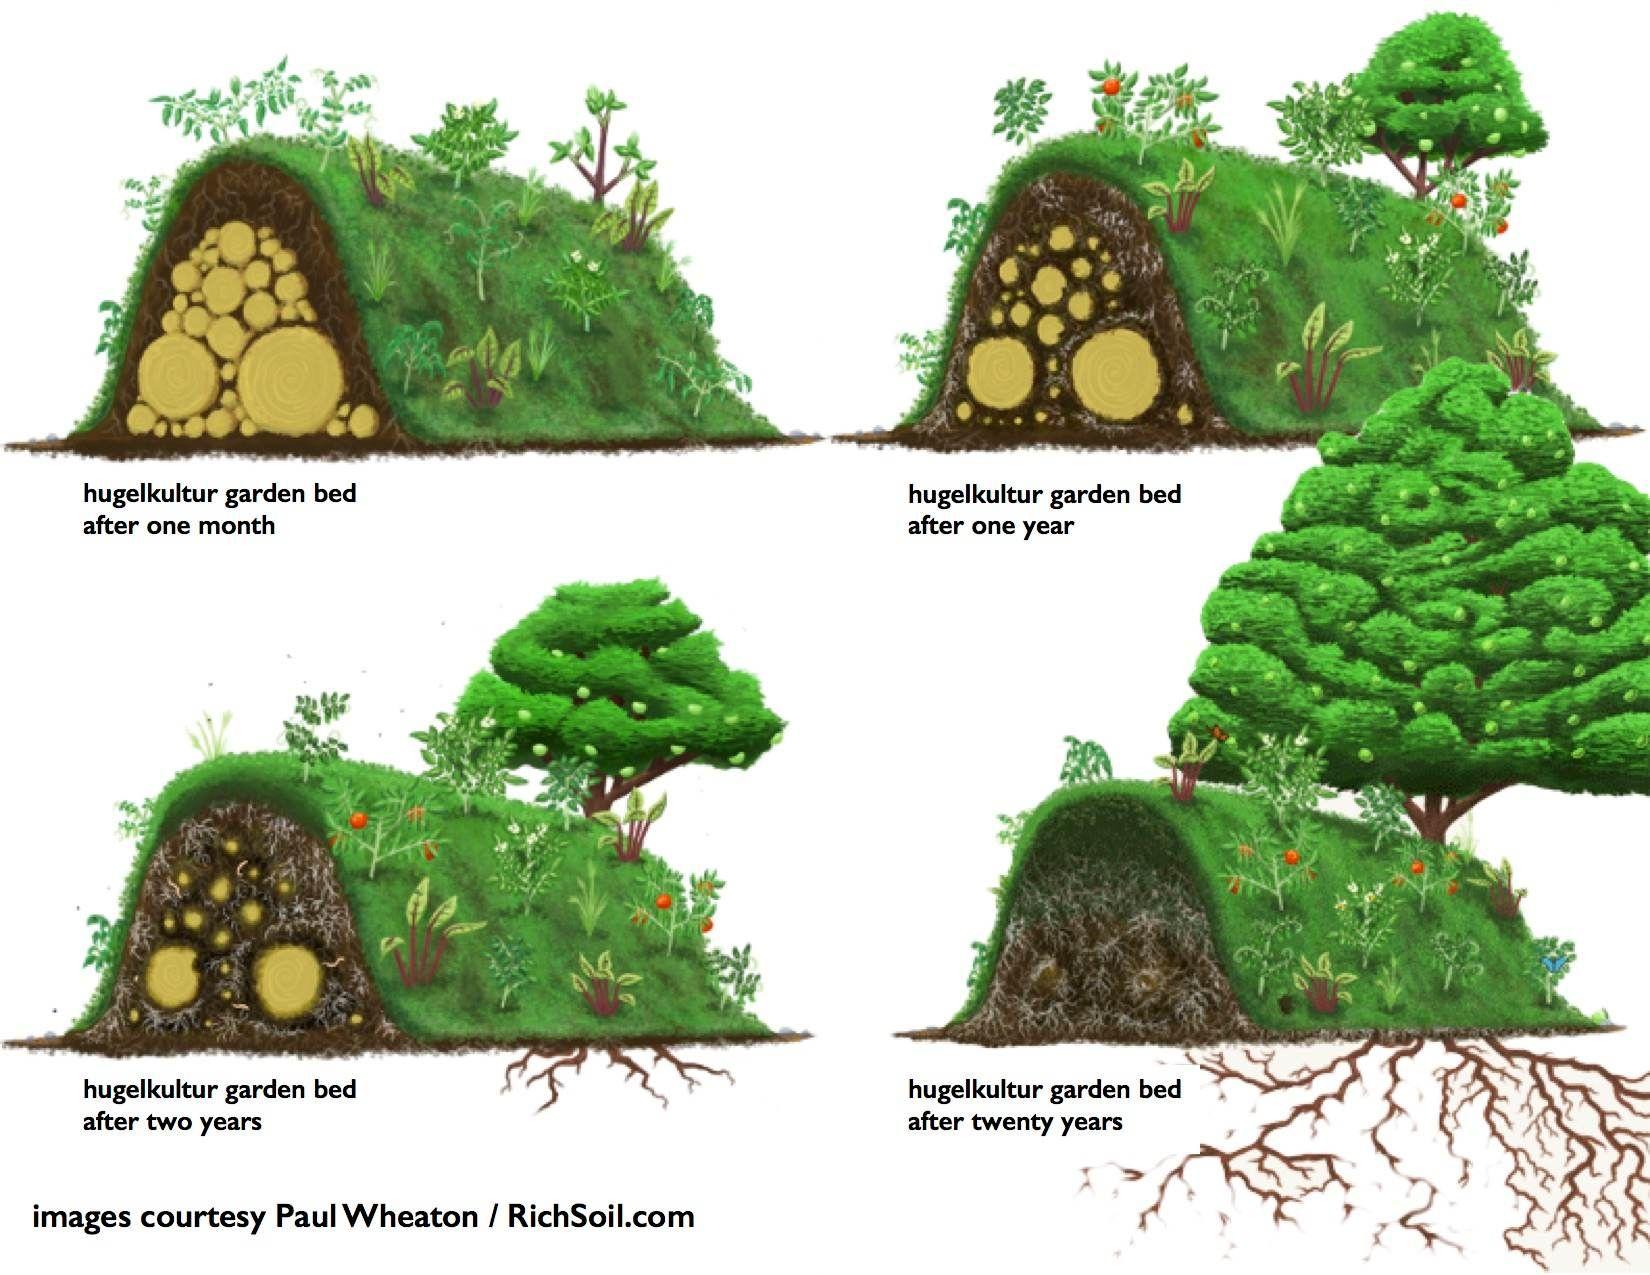 Garden bed with trees  Trees on hugel beds hugelkultur forum at permies  Gardening ideas